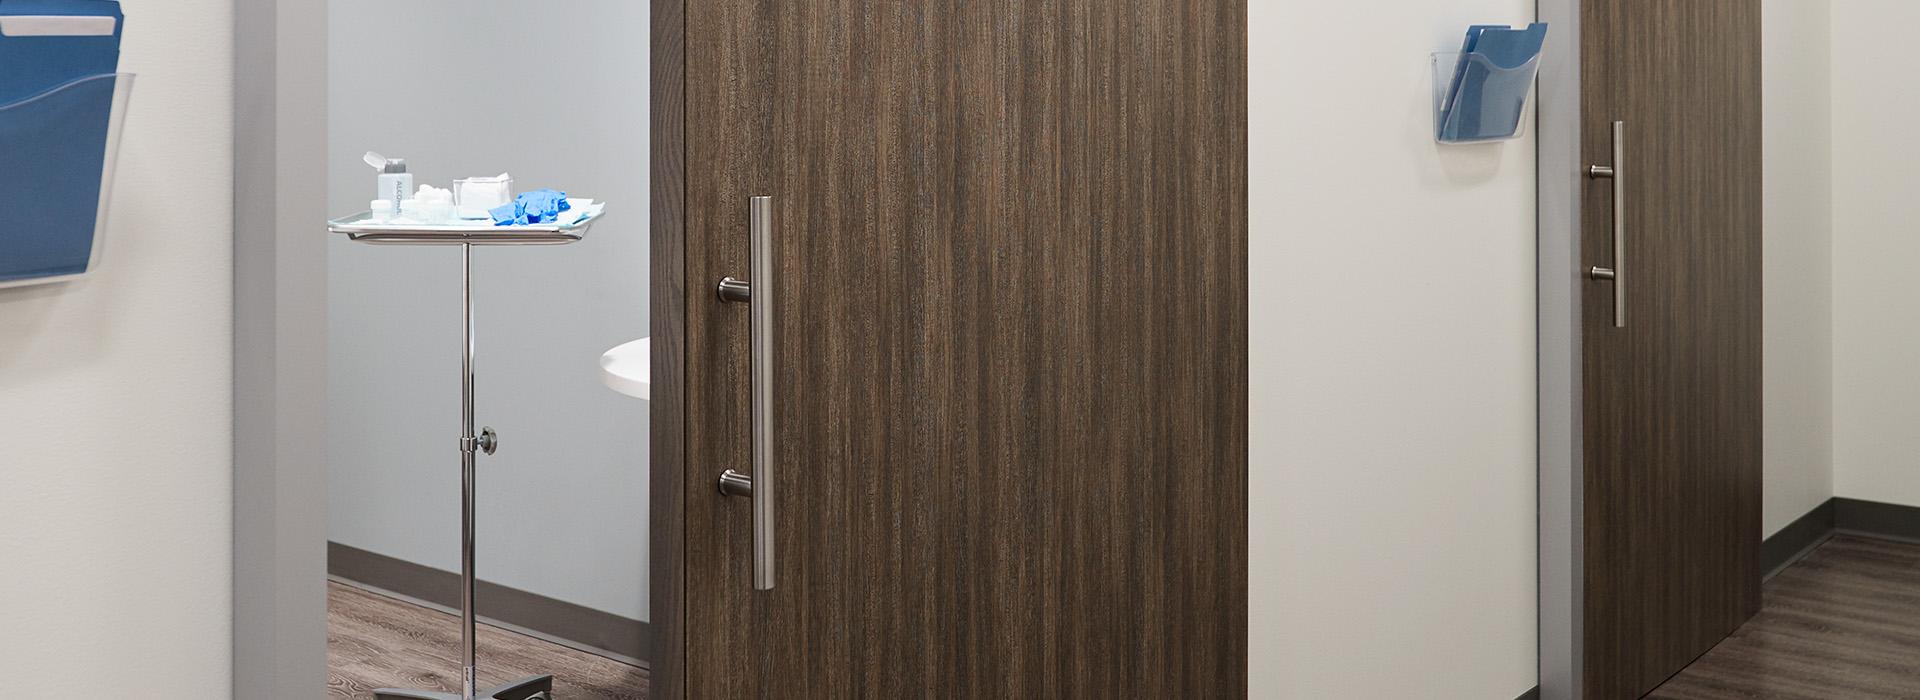 Portes en Stratifié de marque Formica® 8915-NG Fibre de Bois de Noyer